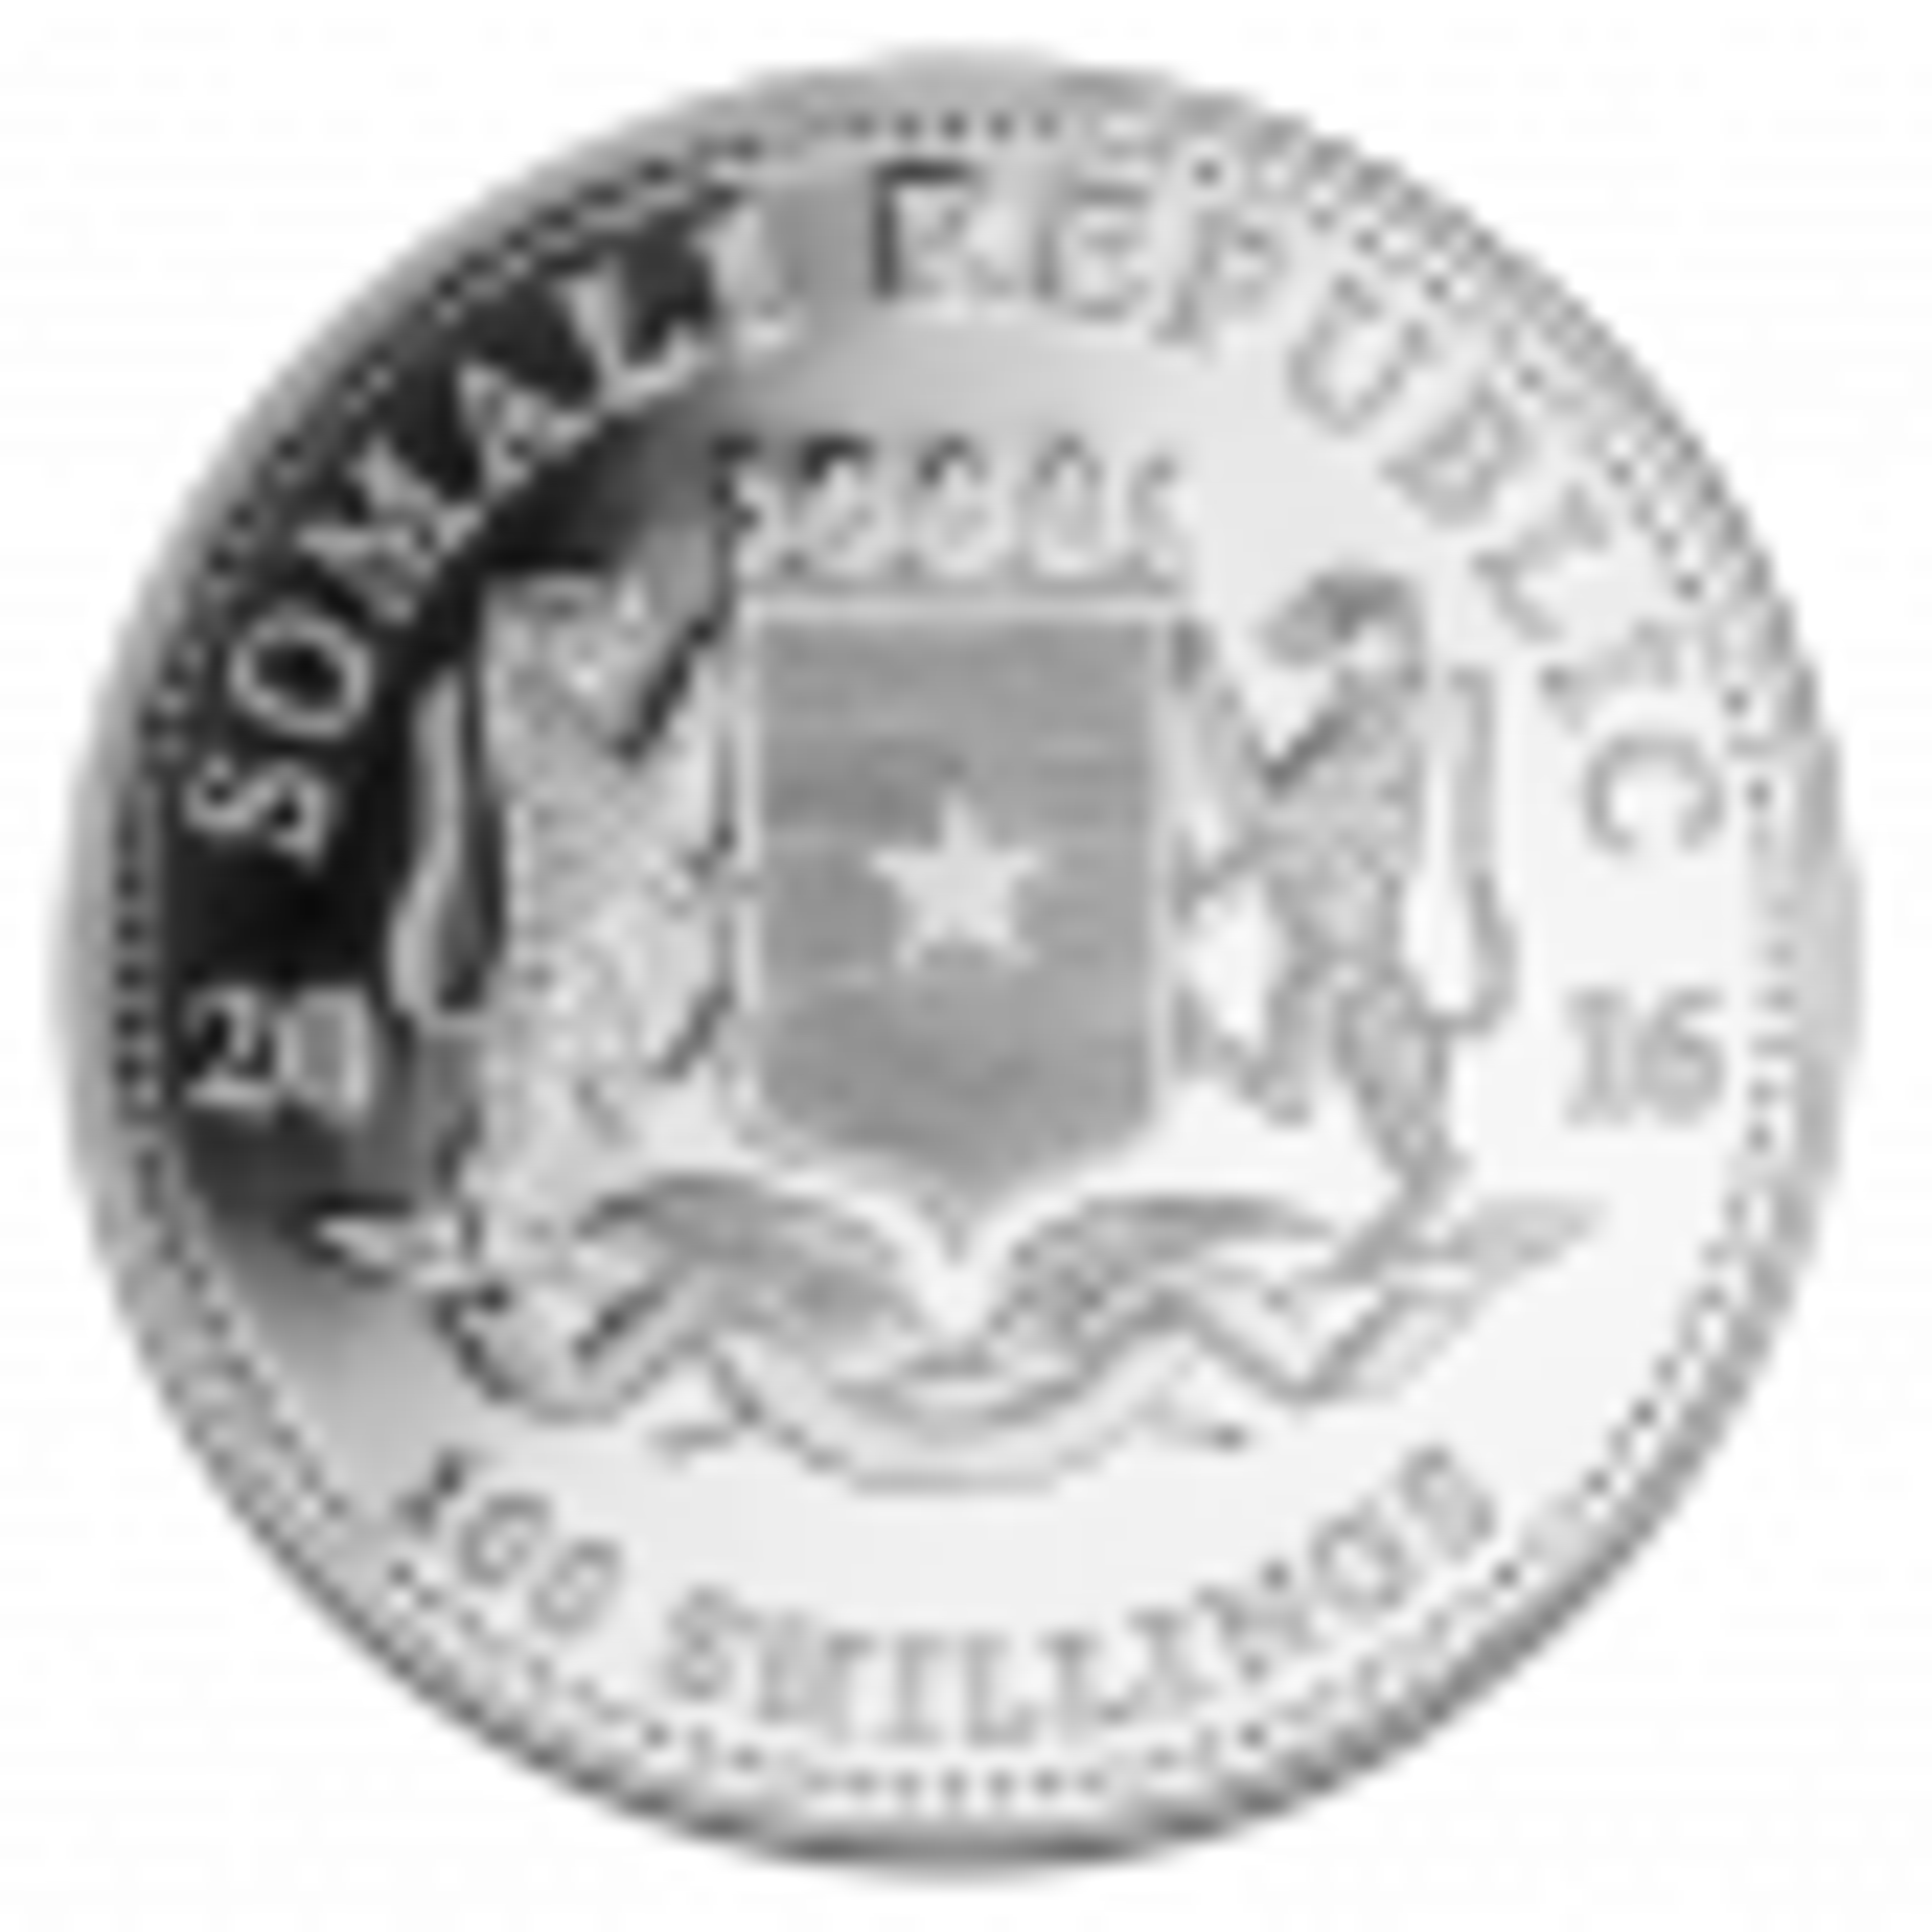 1 Troy ounce zilver munt Somalische Olifant 2016